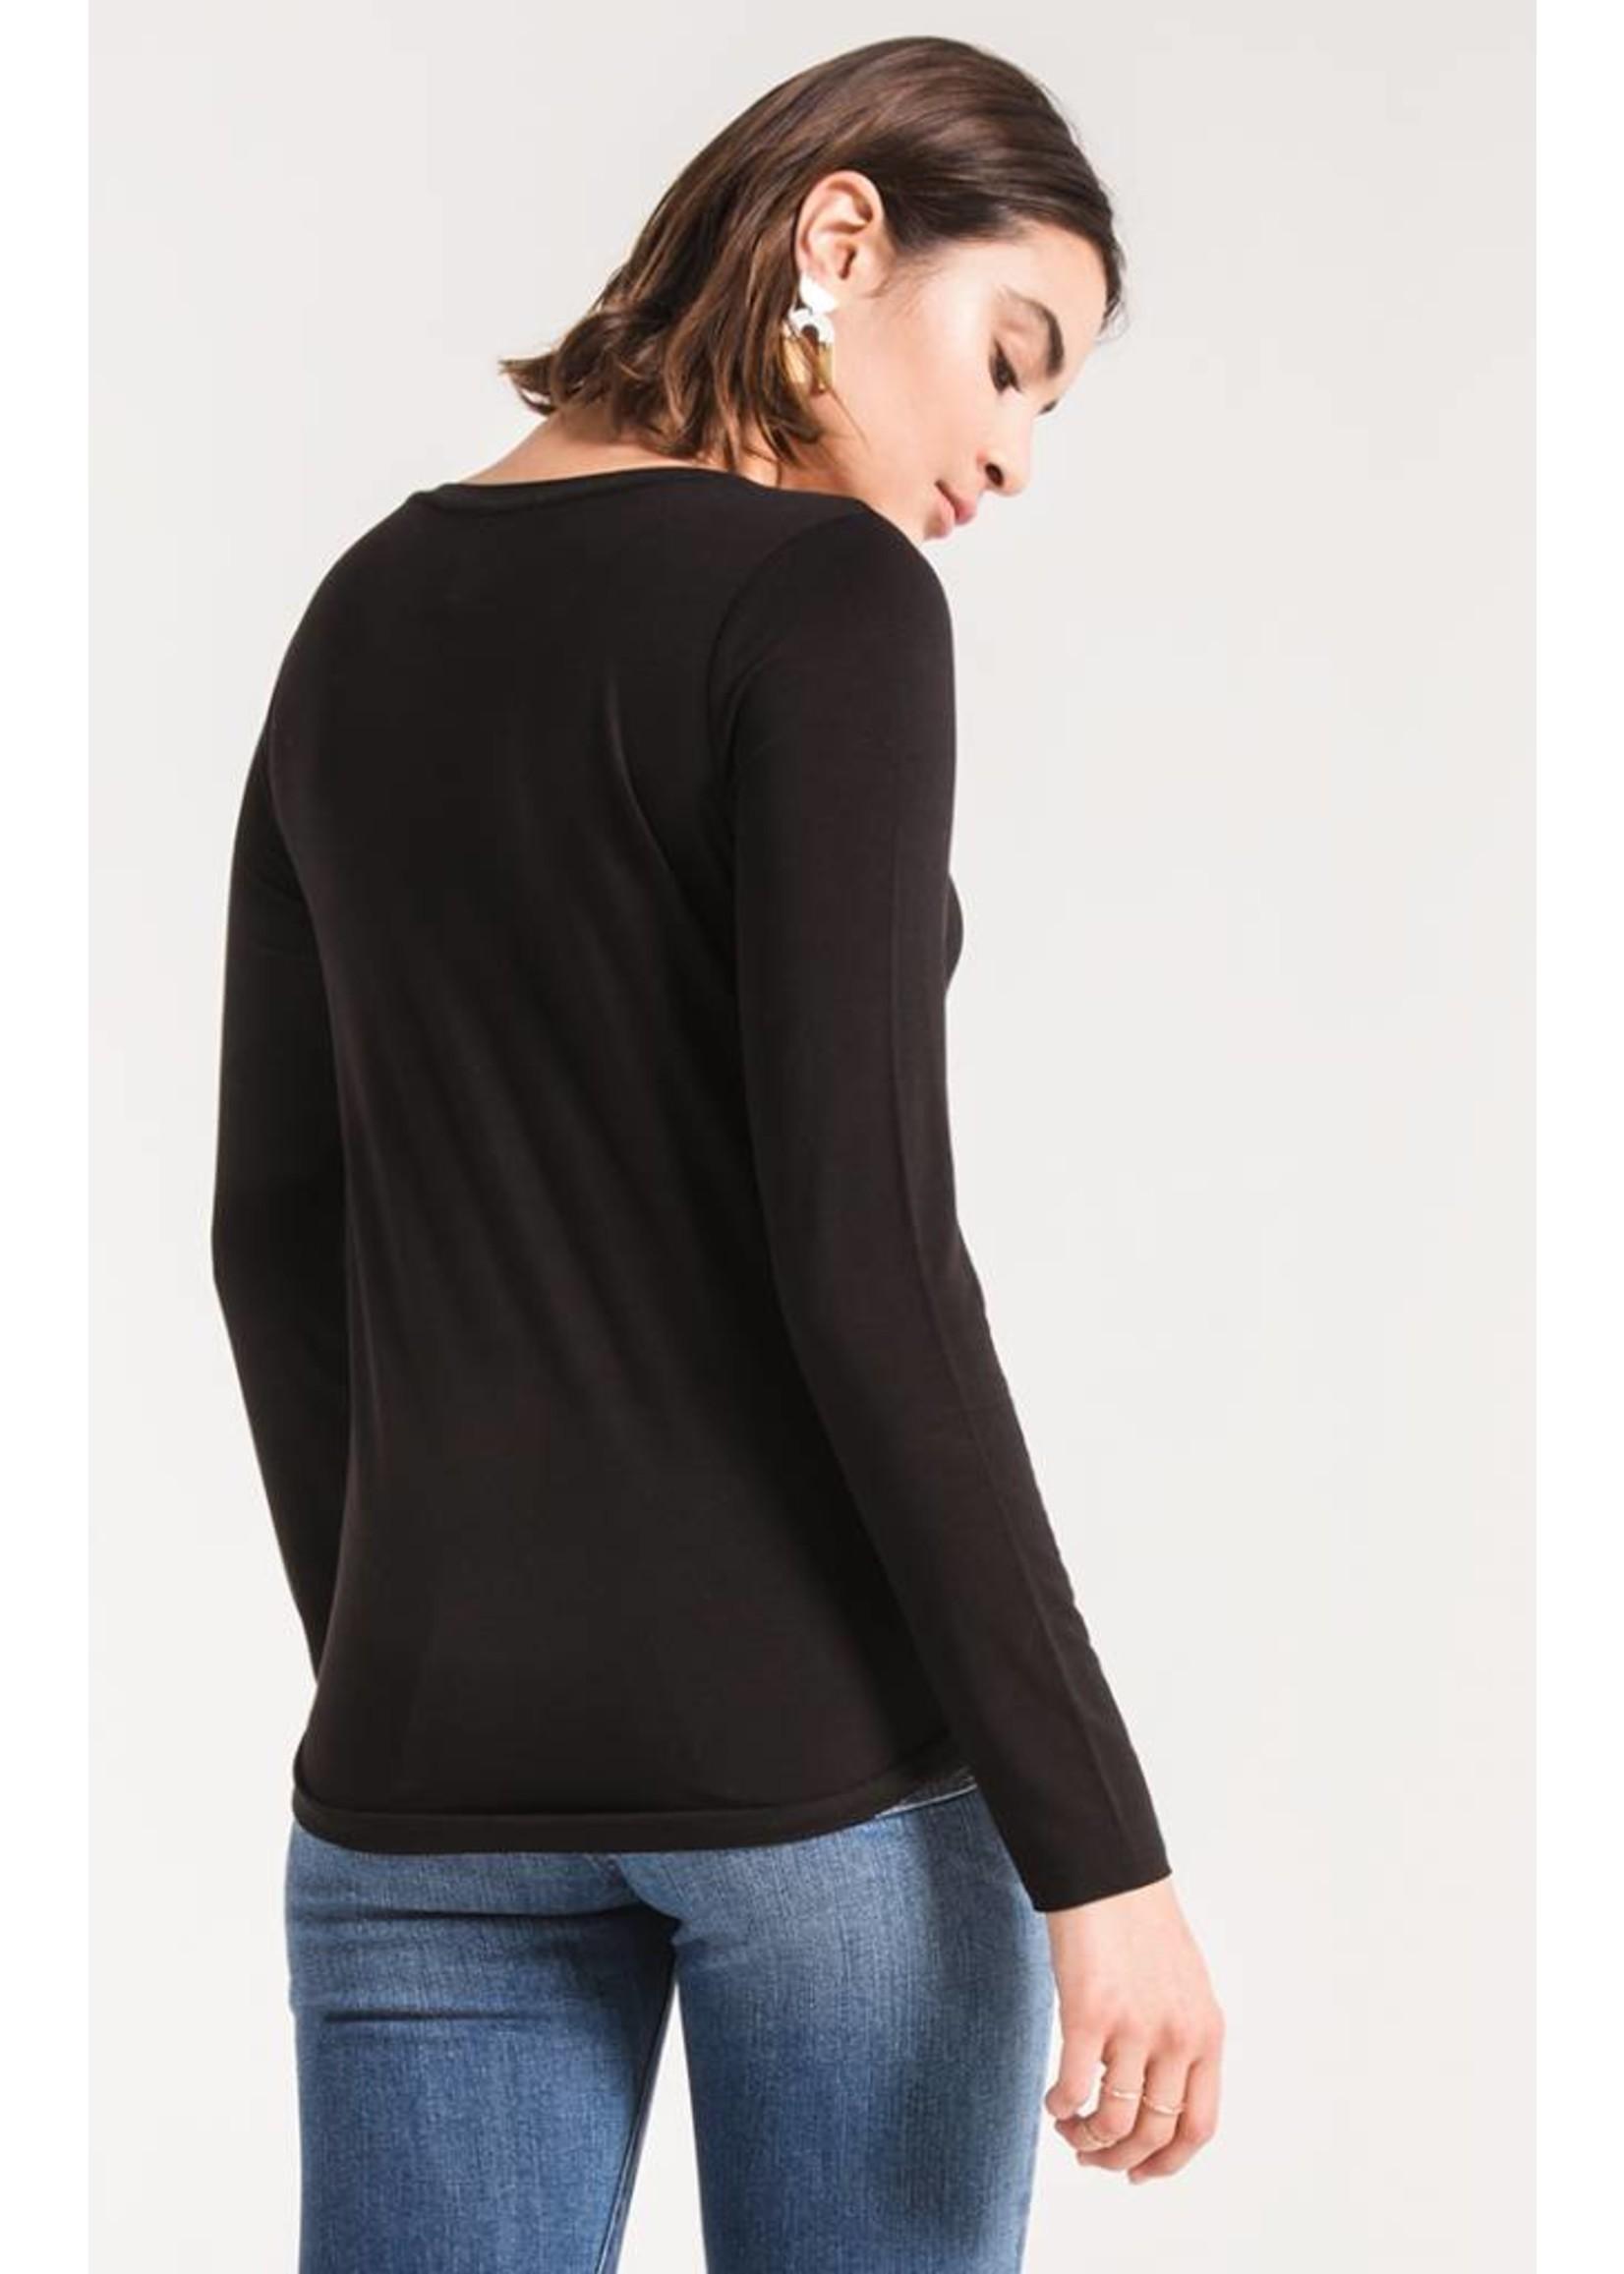 Twist Front Long Sleeve Tee- black